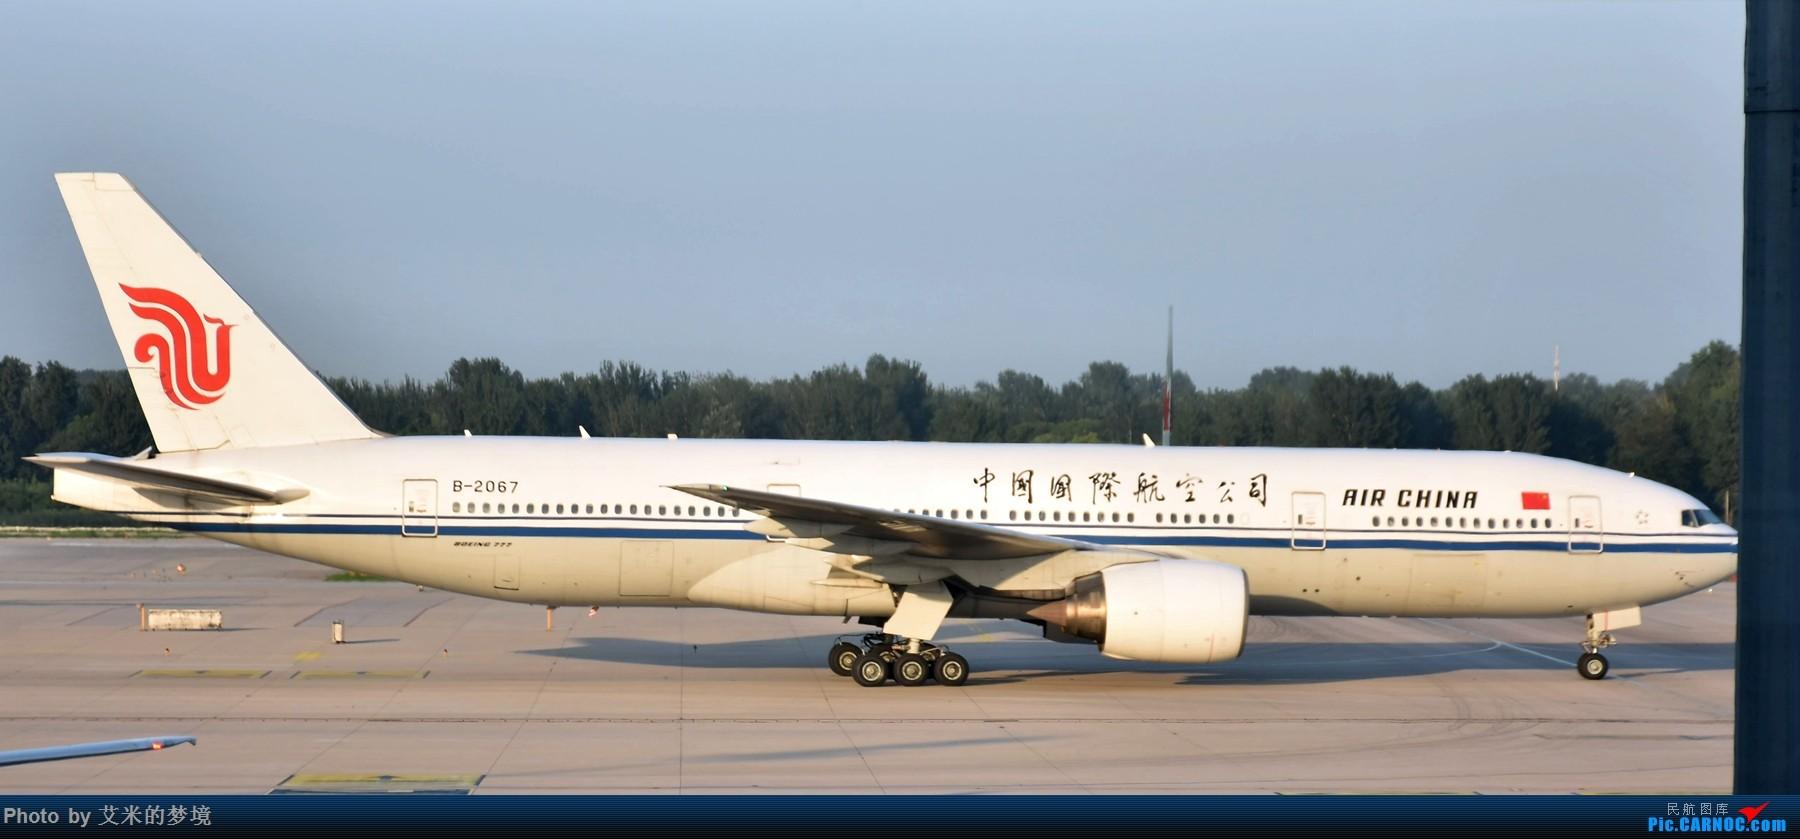 Re:[原创]【carnoc重庆飞友会】北京送行,所见飞行 BOEING 777-200 B-2067 中国北京首都国际机场